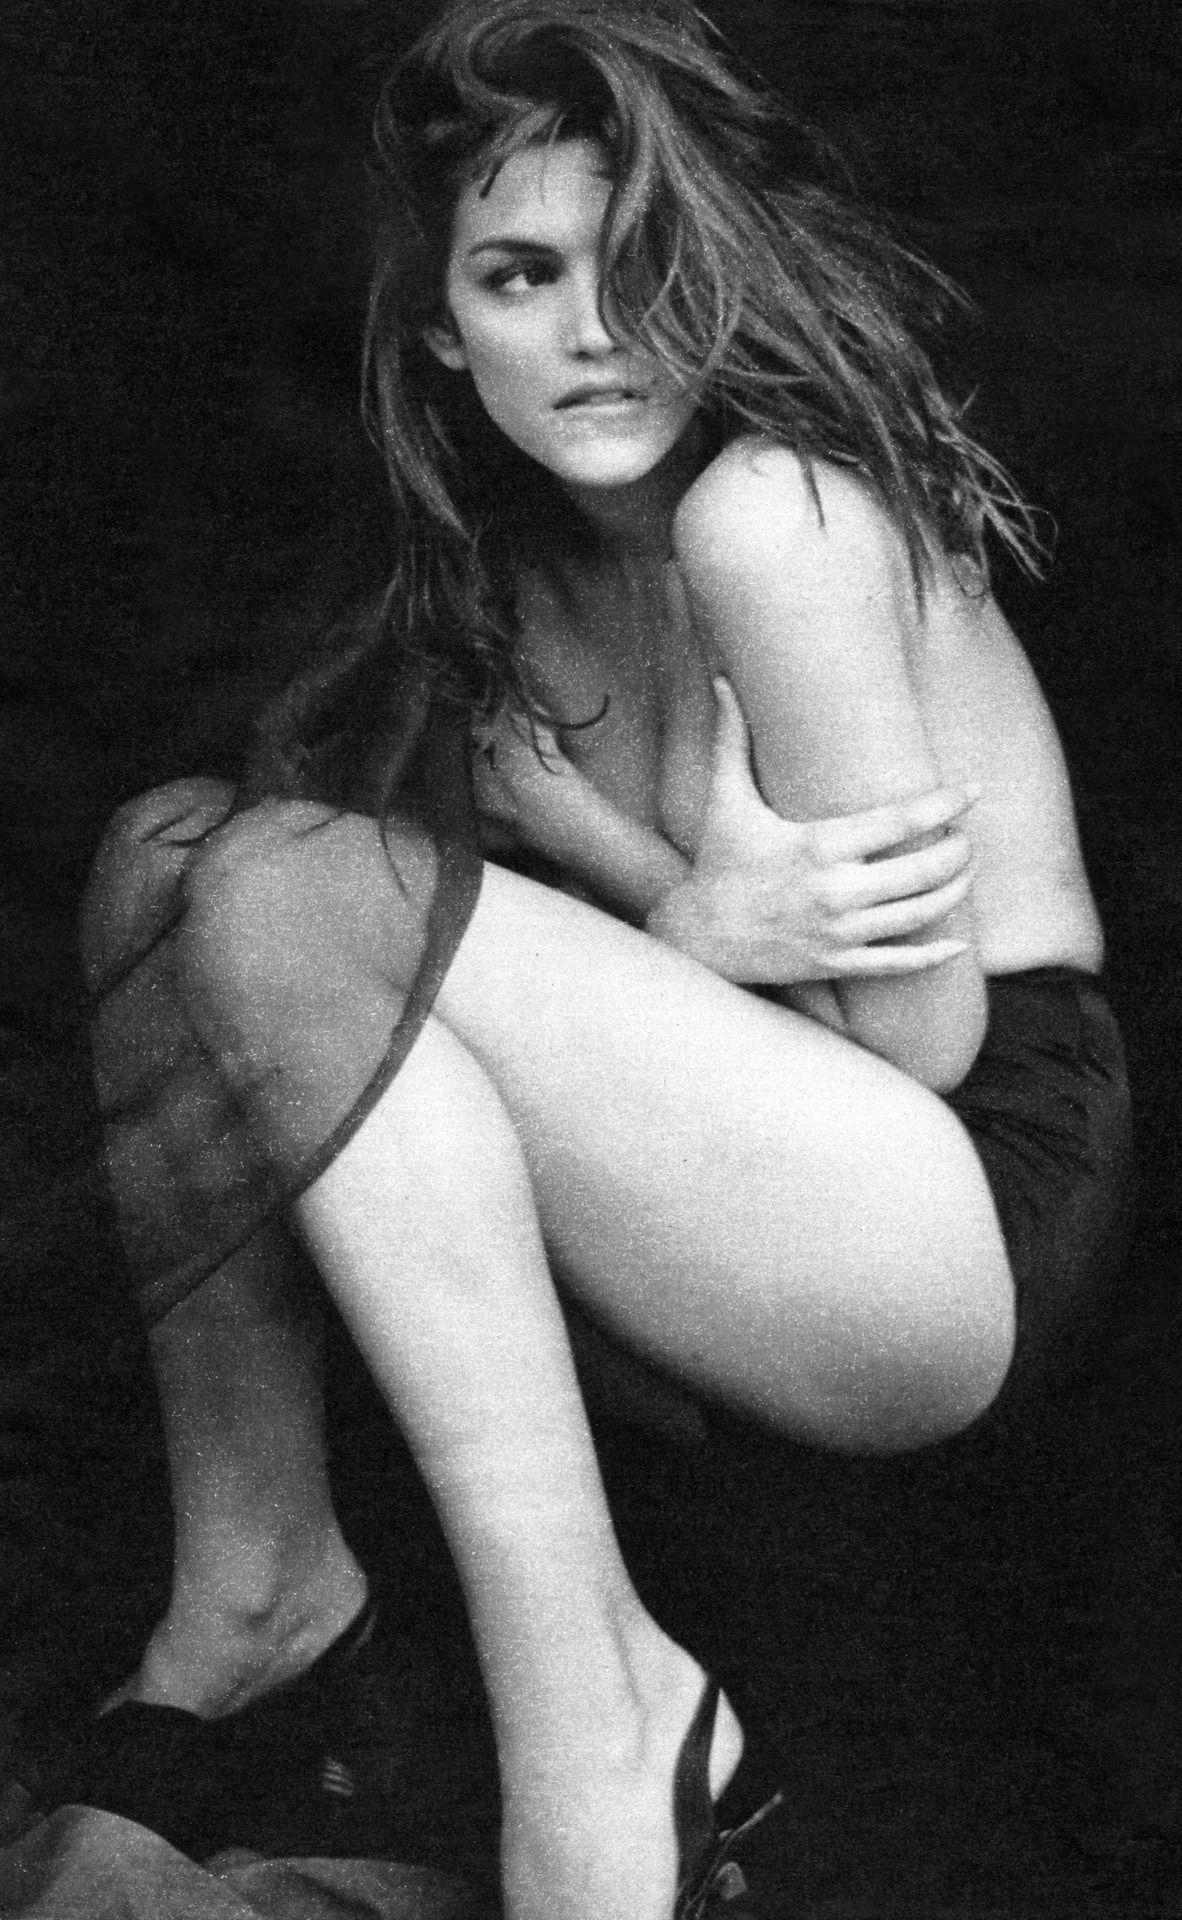 Emily ratajkowski karlie kloss topless sexy photos new pics